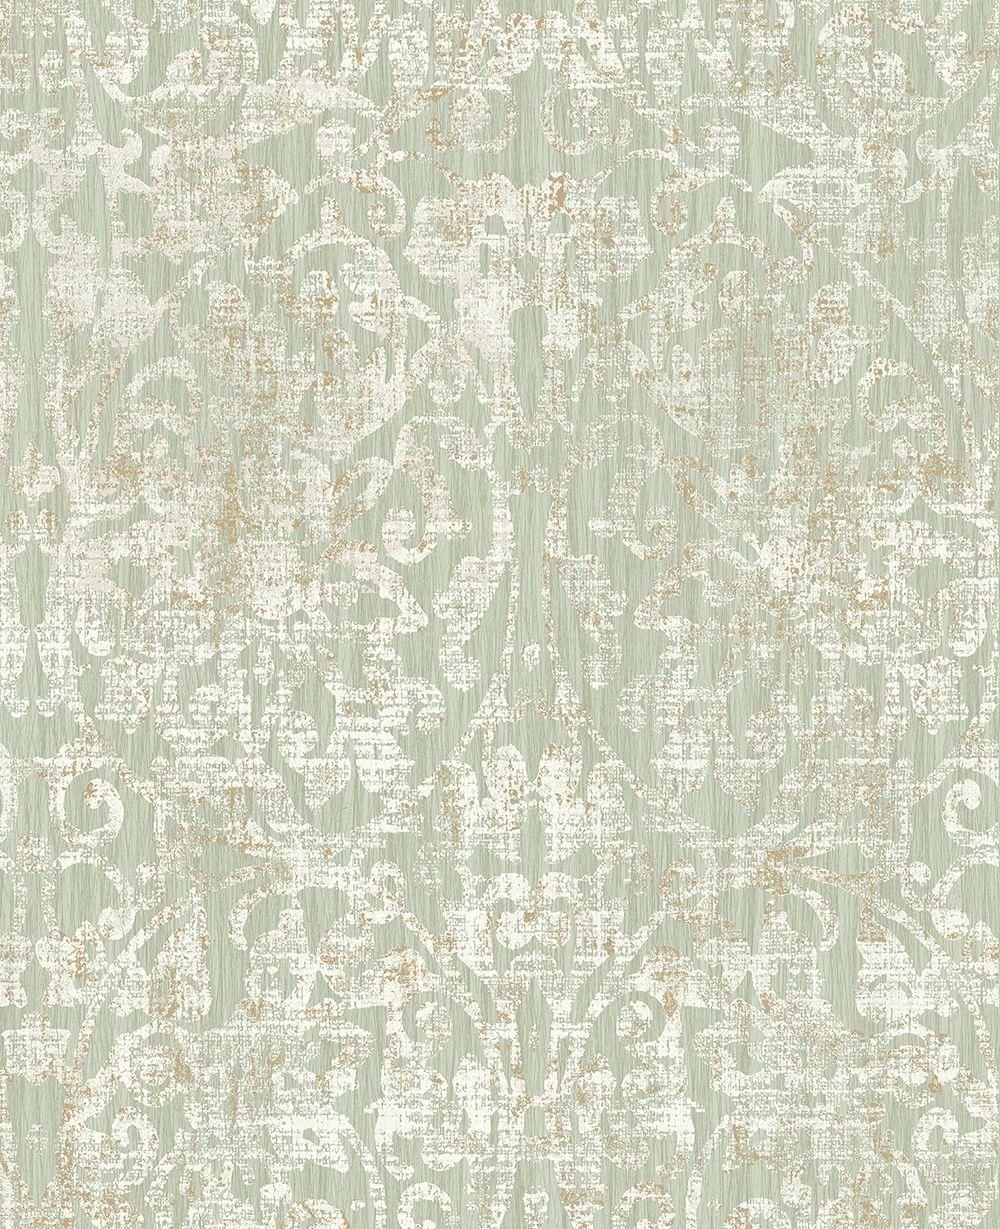 Hurst Damask by Elizabeth Ockford - Sage - Wallpaper ...